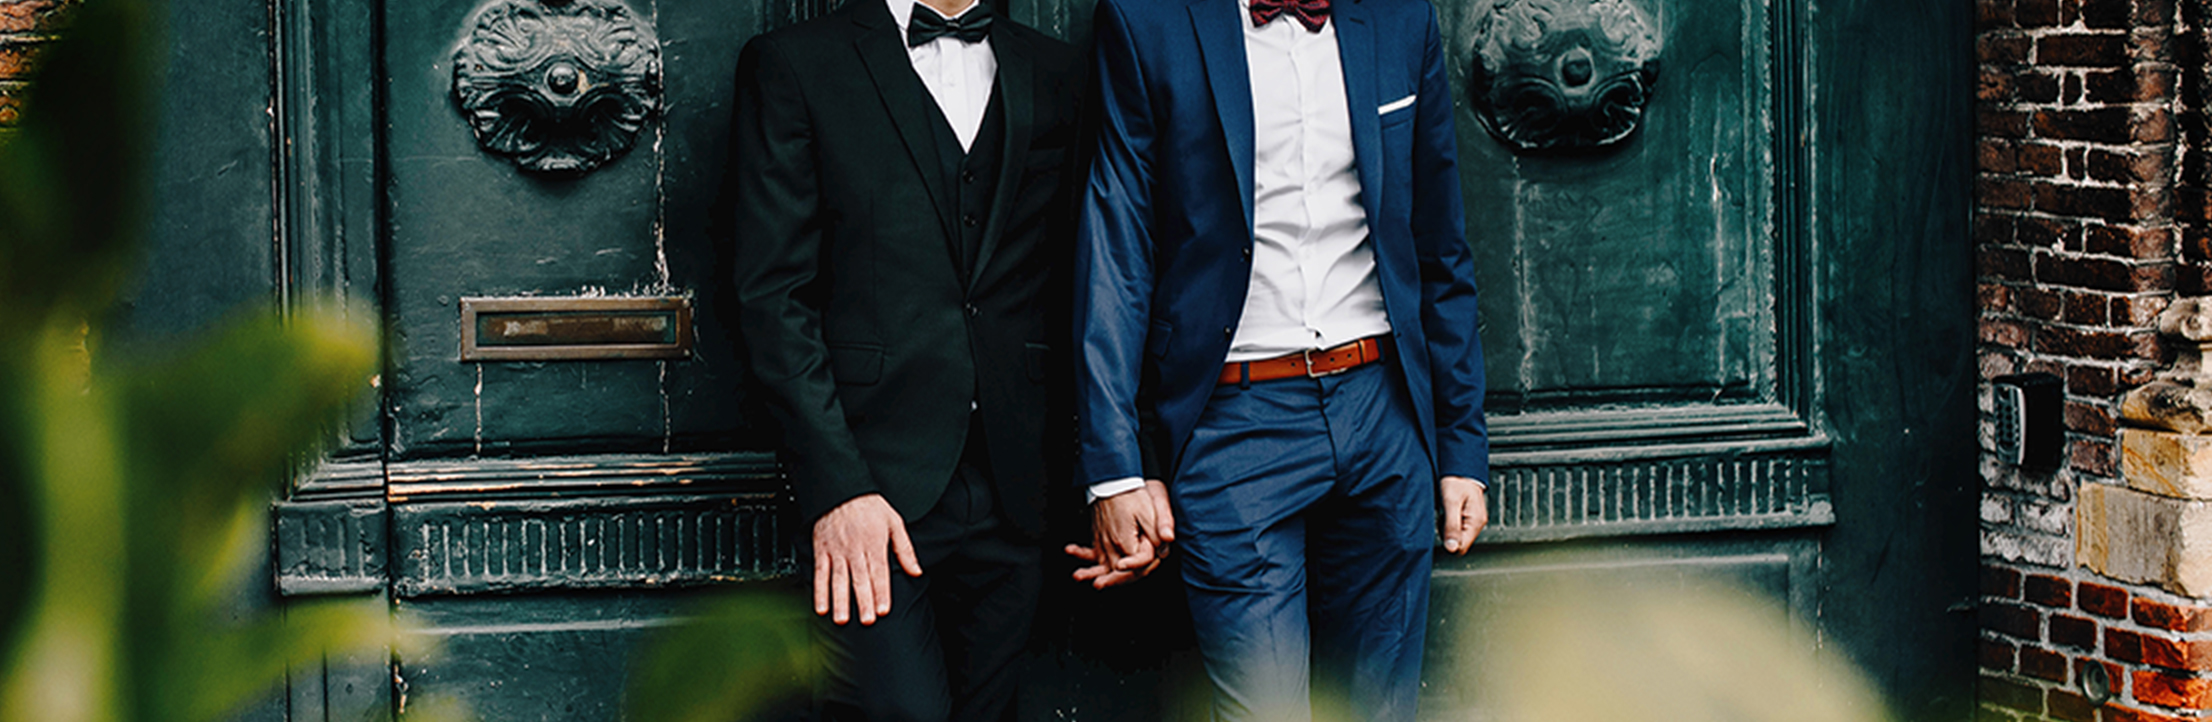 Men proposal ideas for gay 15 Proposal